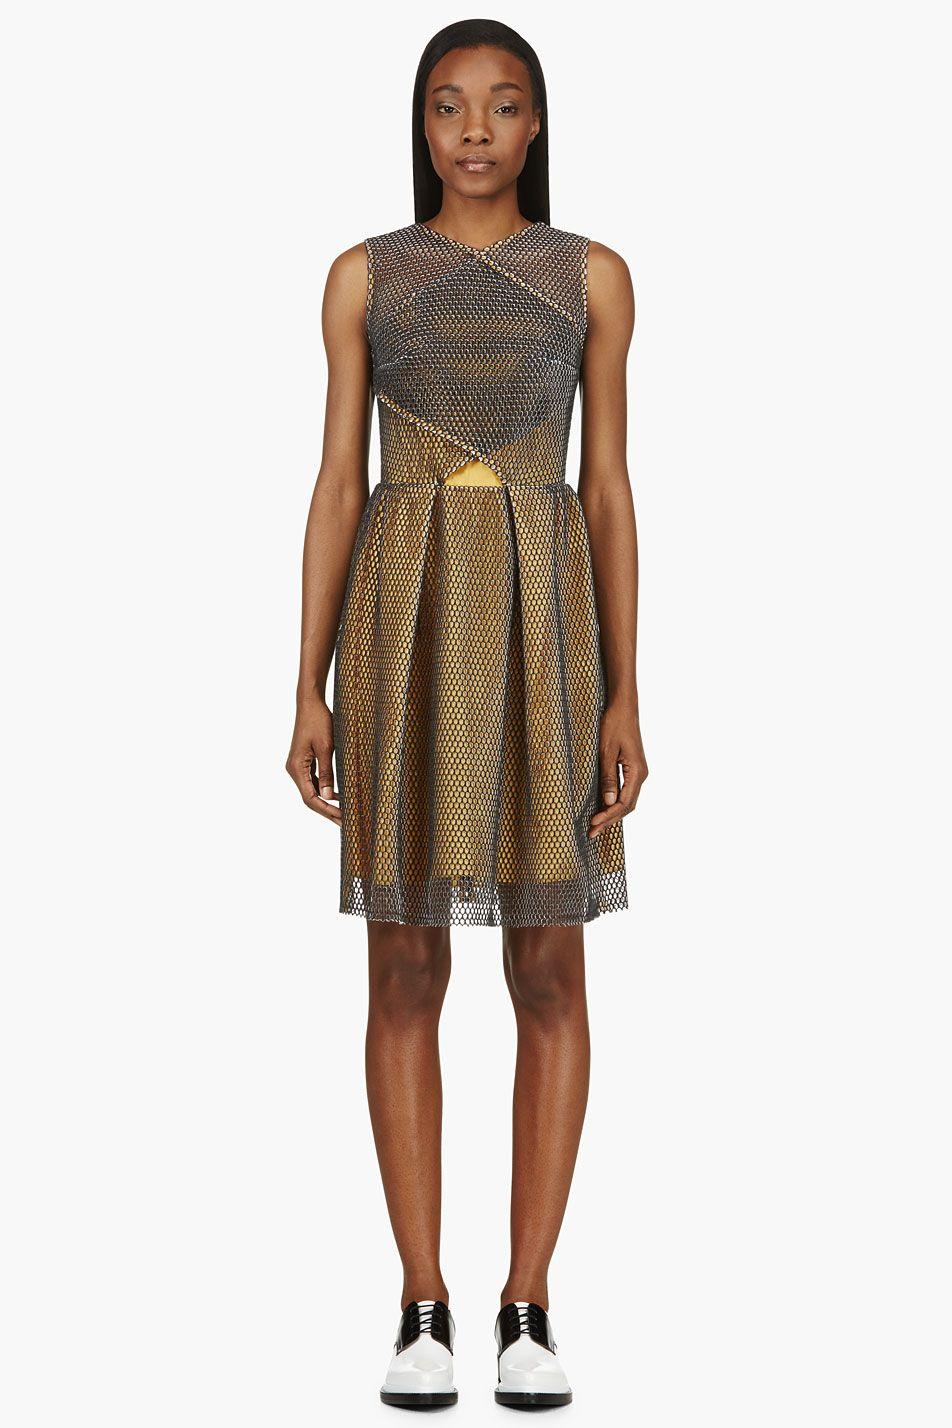 Carven black u gold mesh resille dress dress up pinterest